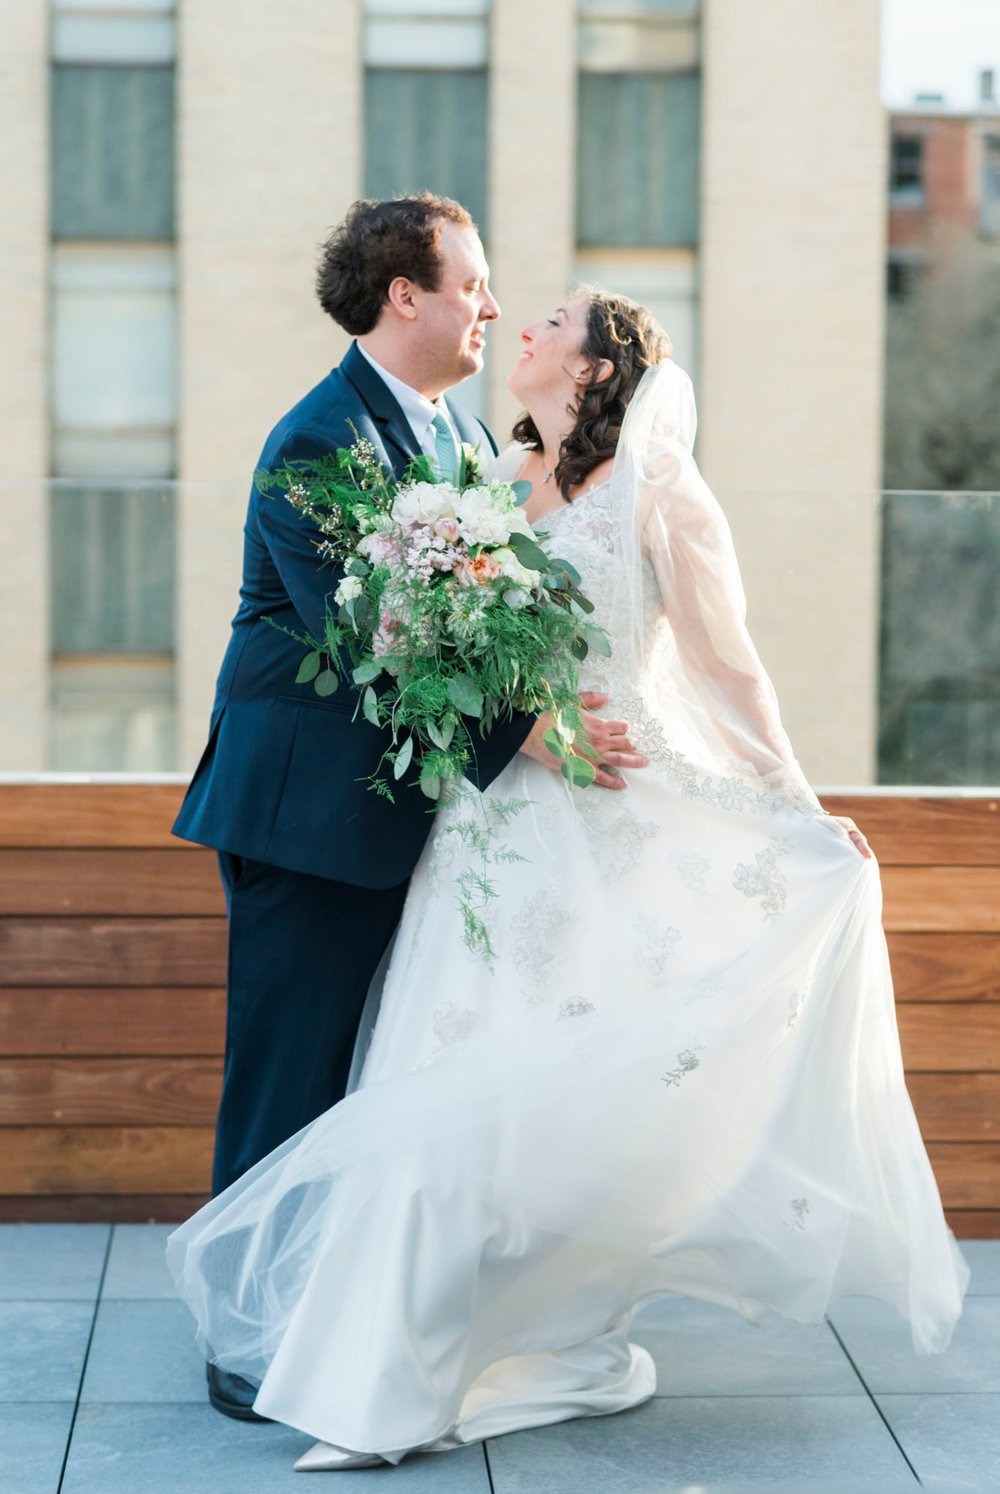 TheVirginianHotel_LynchburgVA_TheVirginianHotelWedding_Virginiaweddingphotographer_Lynchburgvawedding 47.jpg